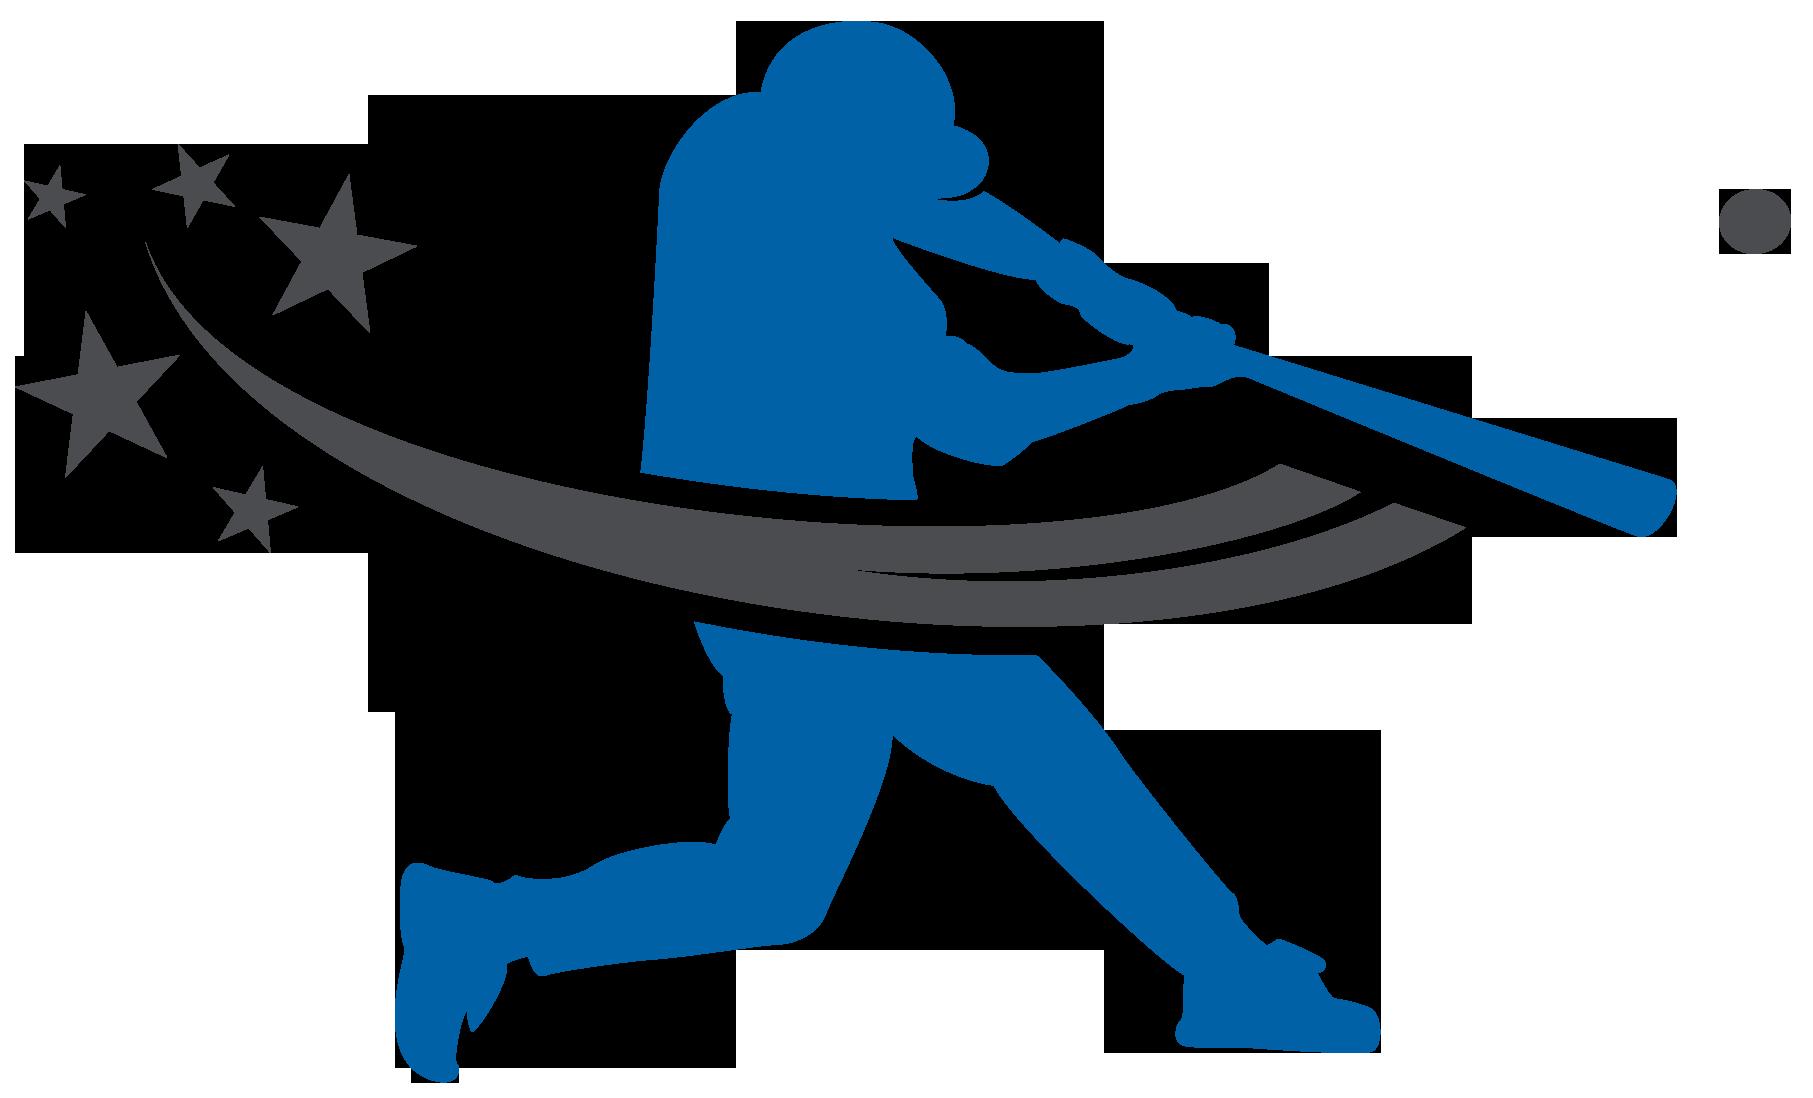 Baseball hitter clipart clip art transparent download Baseball Silhouette Batting Clip art - baseball 1813*1098 transprent ... clip art transparent download